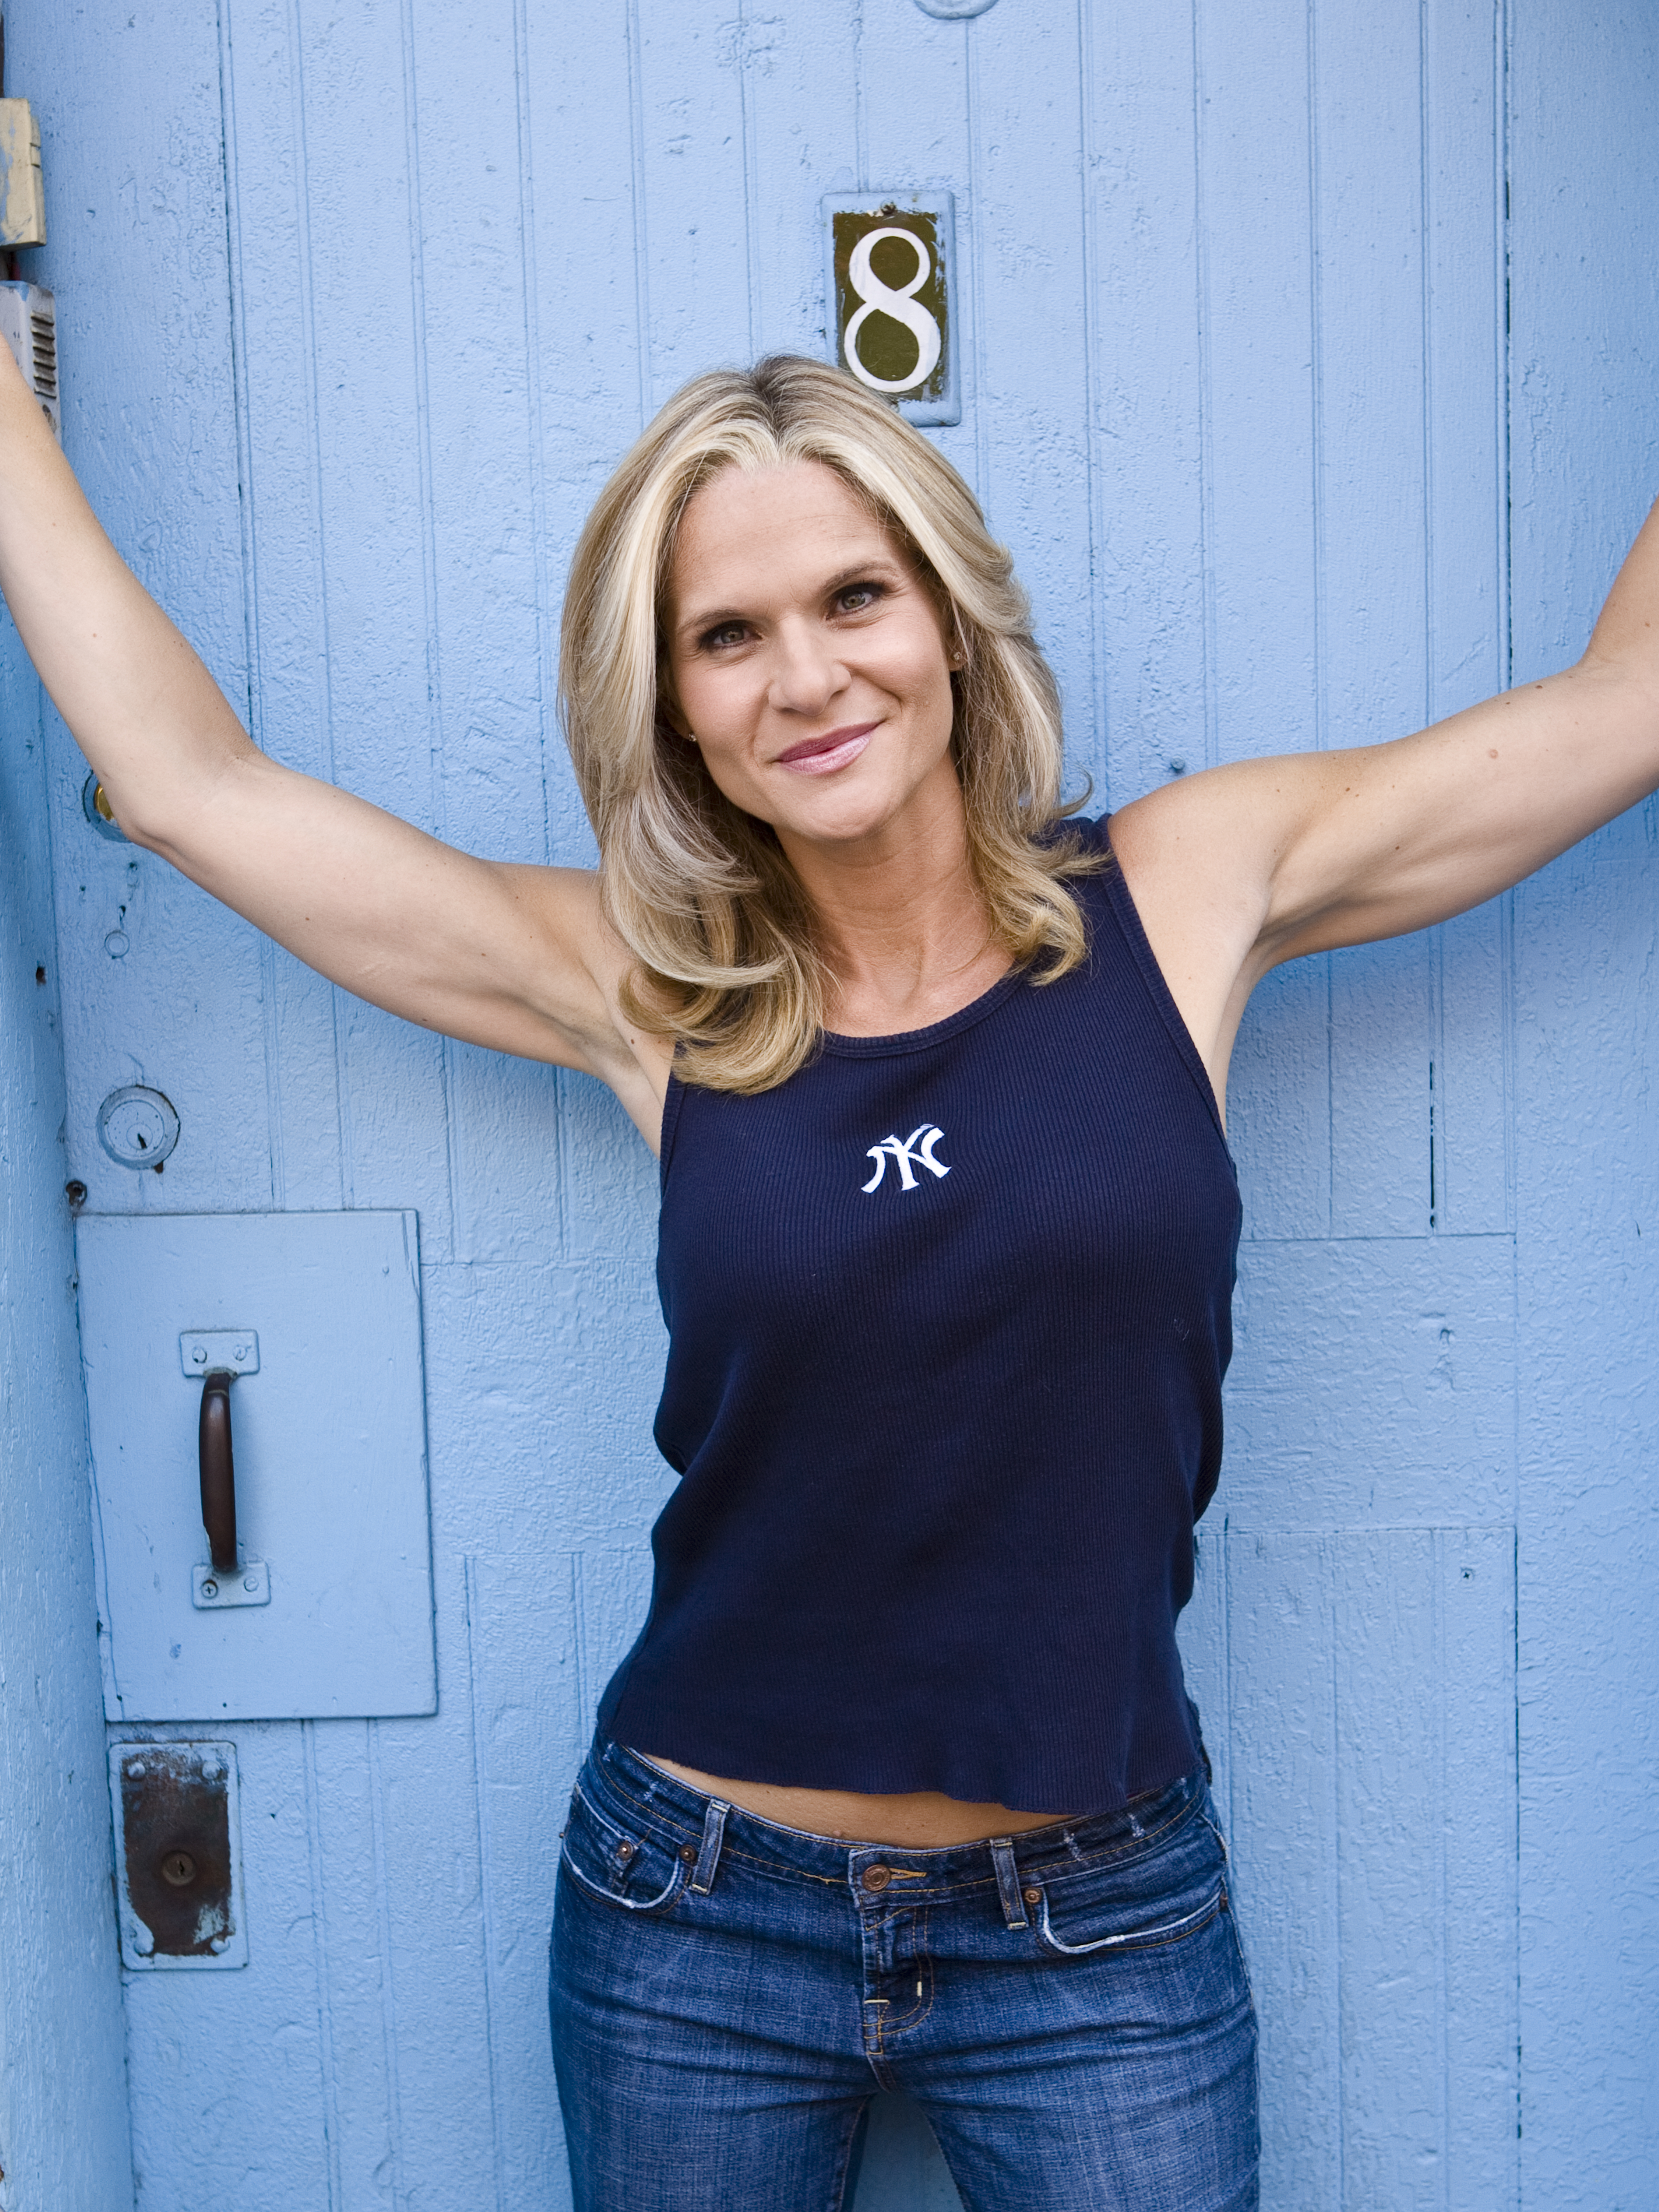 laura harris fitness - photo #12